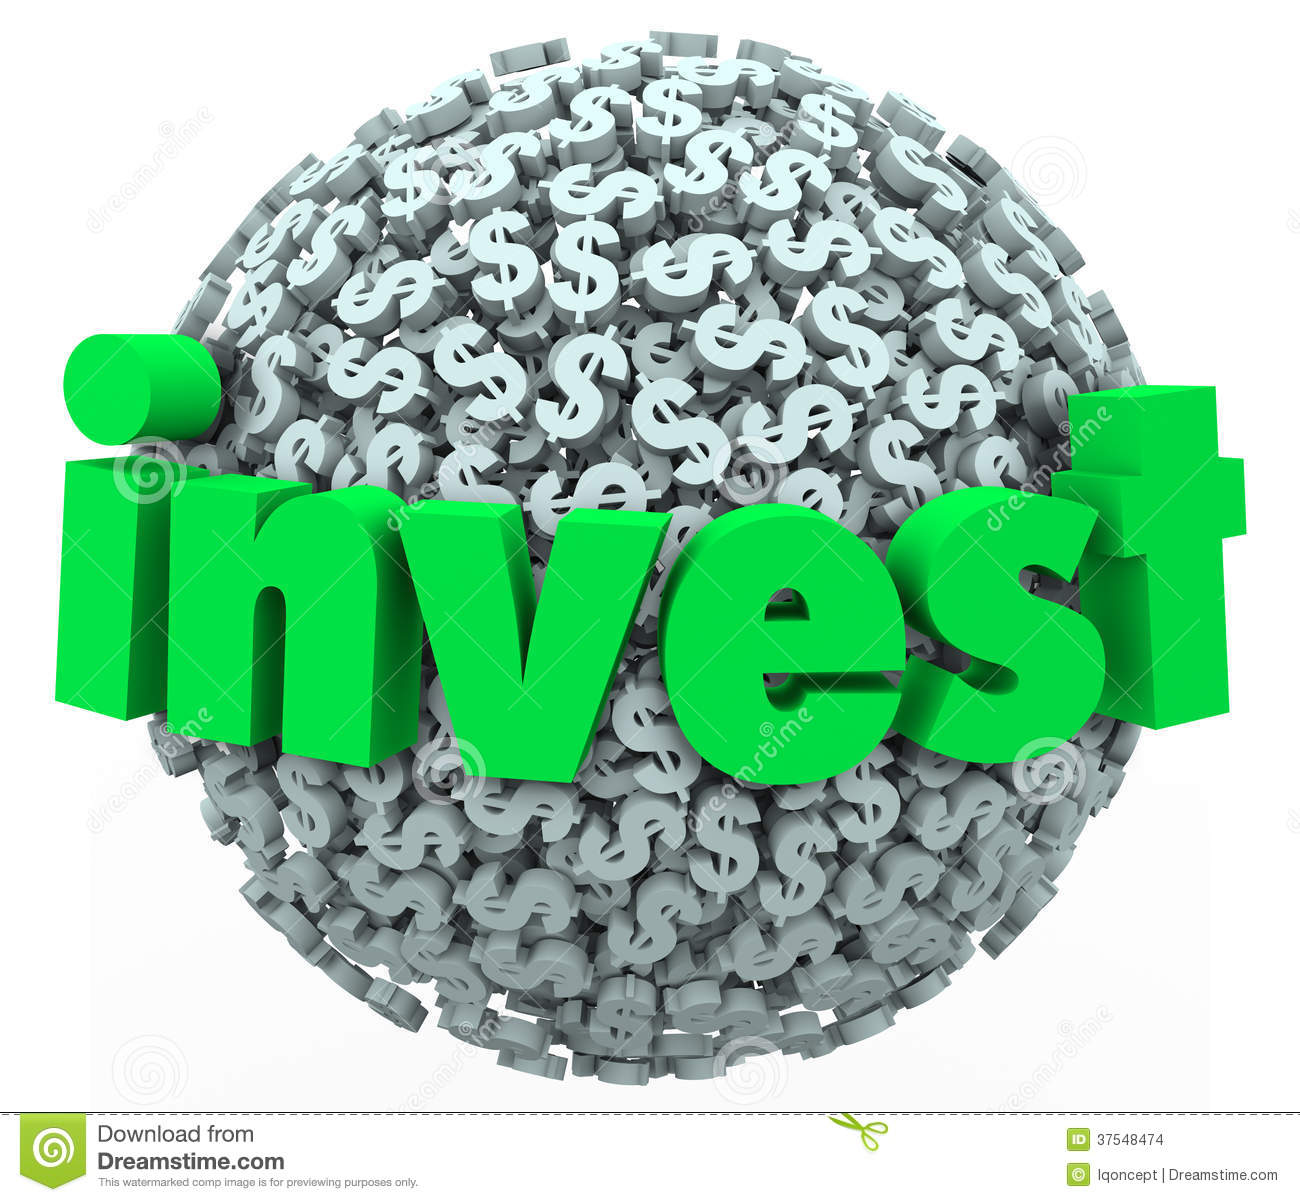 Cash clipart investment, Cash investment Transparent FREE.